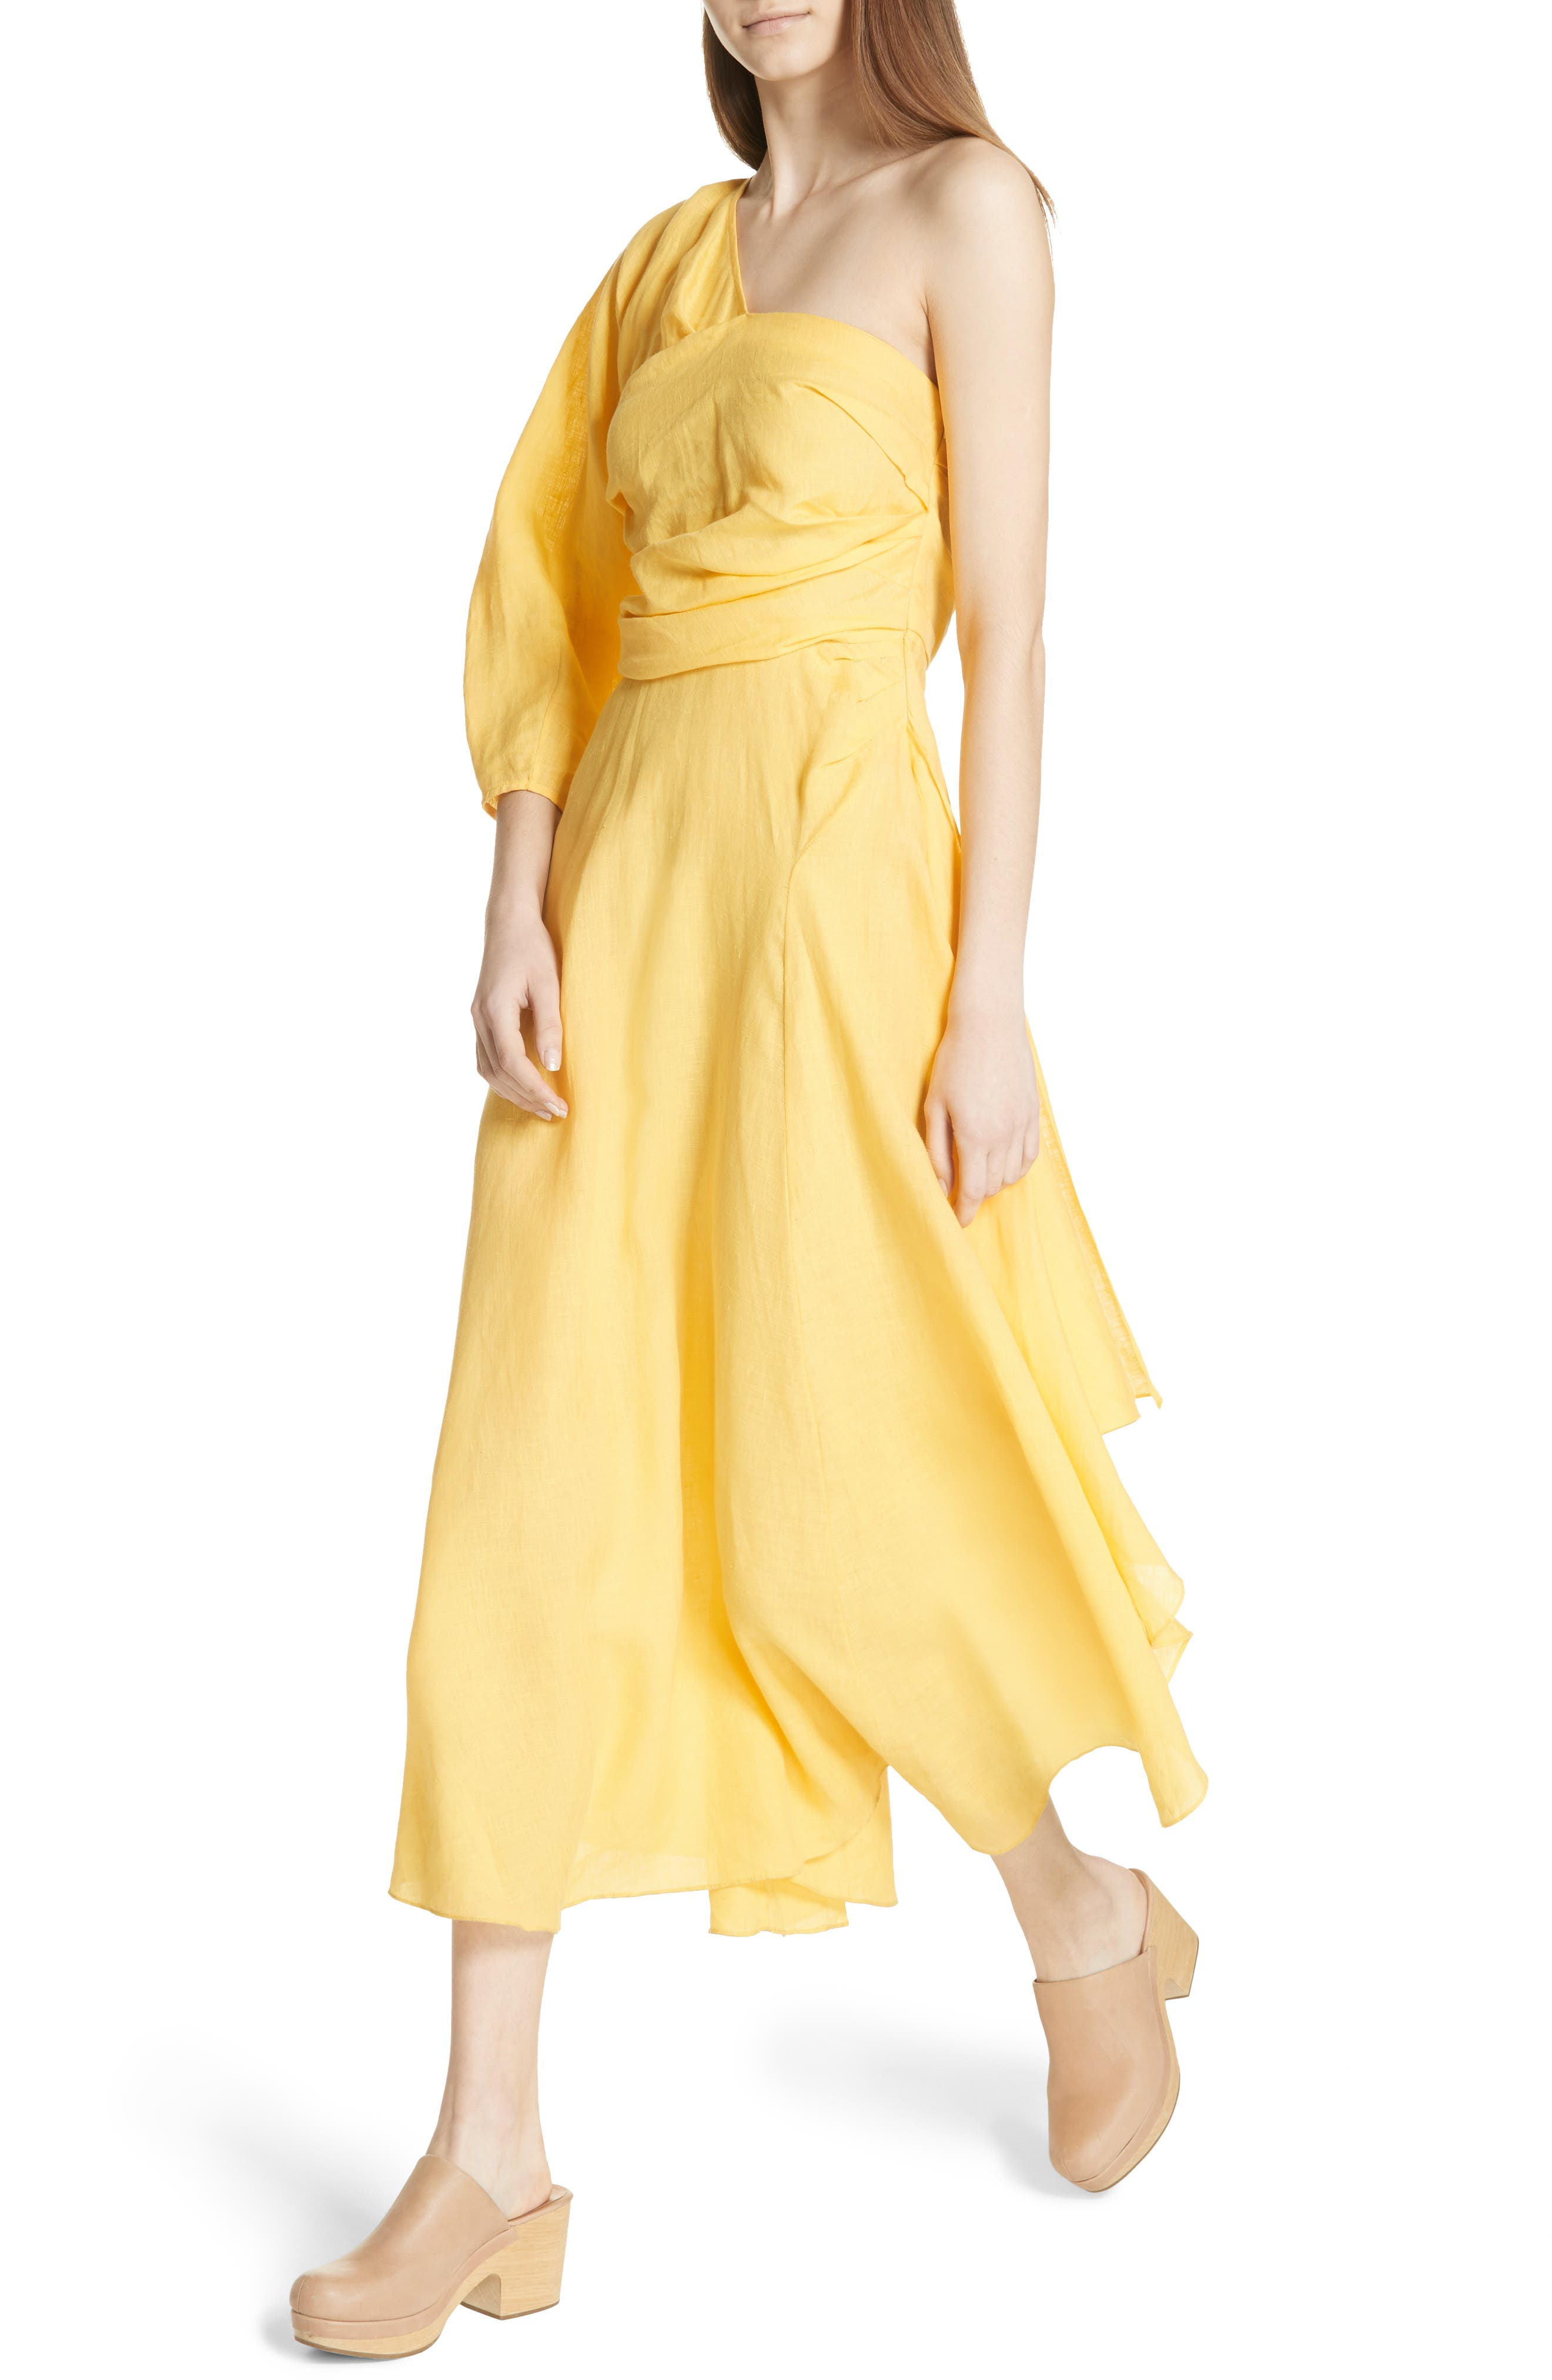 Tipple One-Shoulder Dress,                             Alternate thumbnail 4, color,                             770